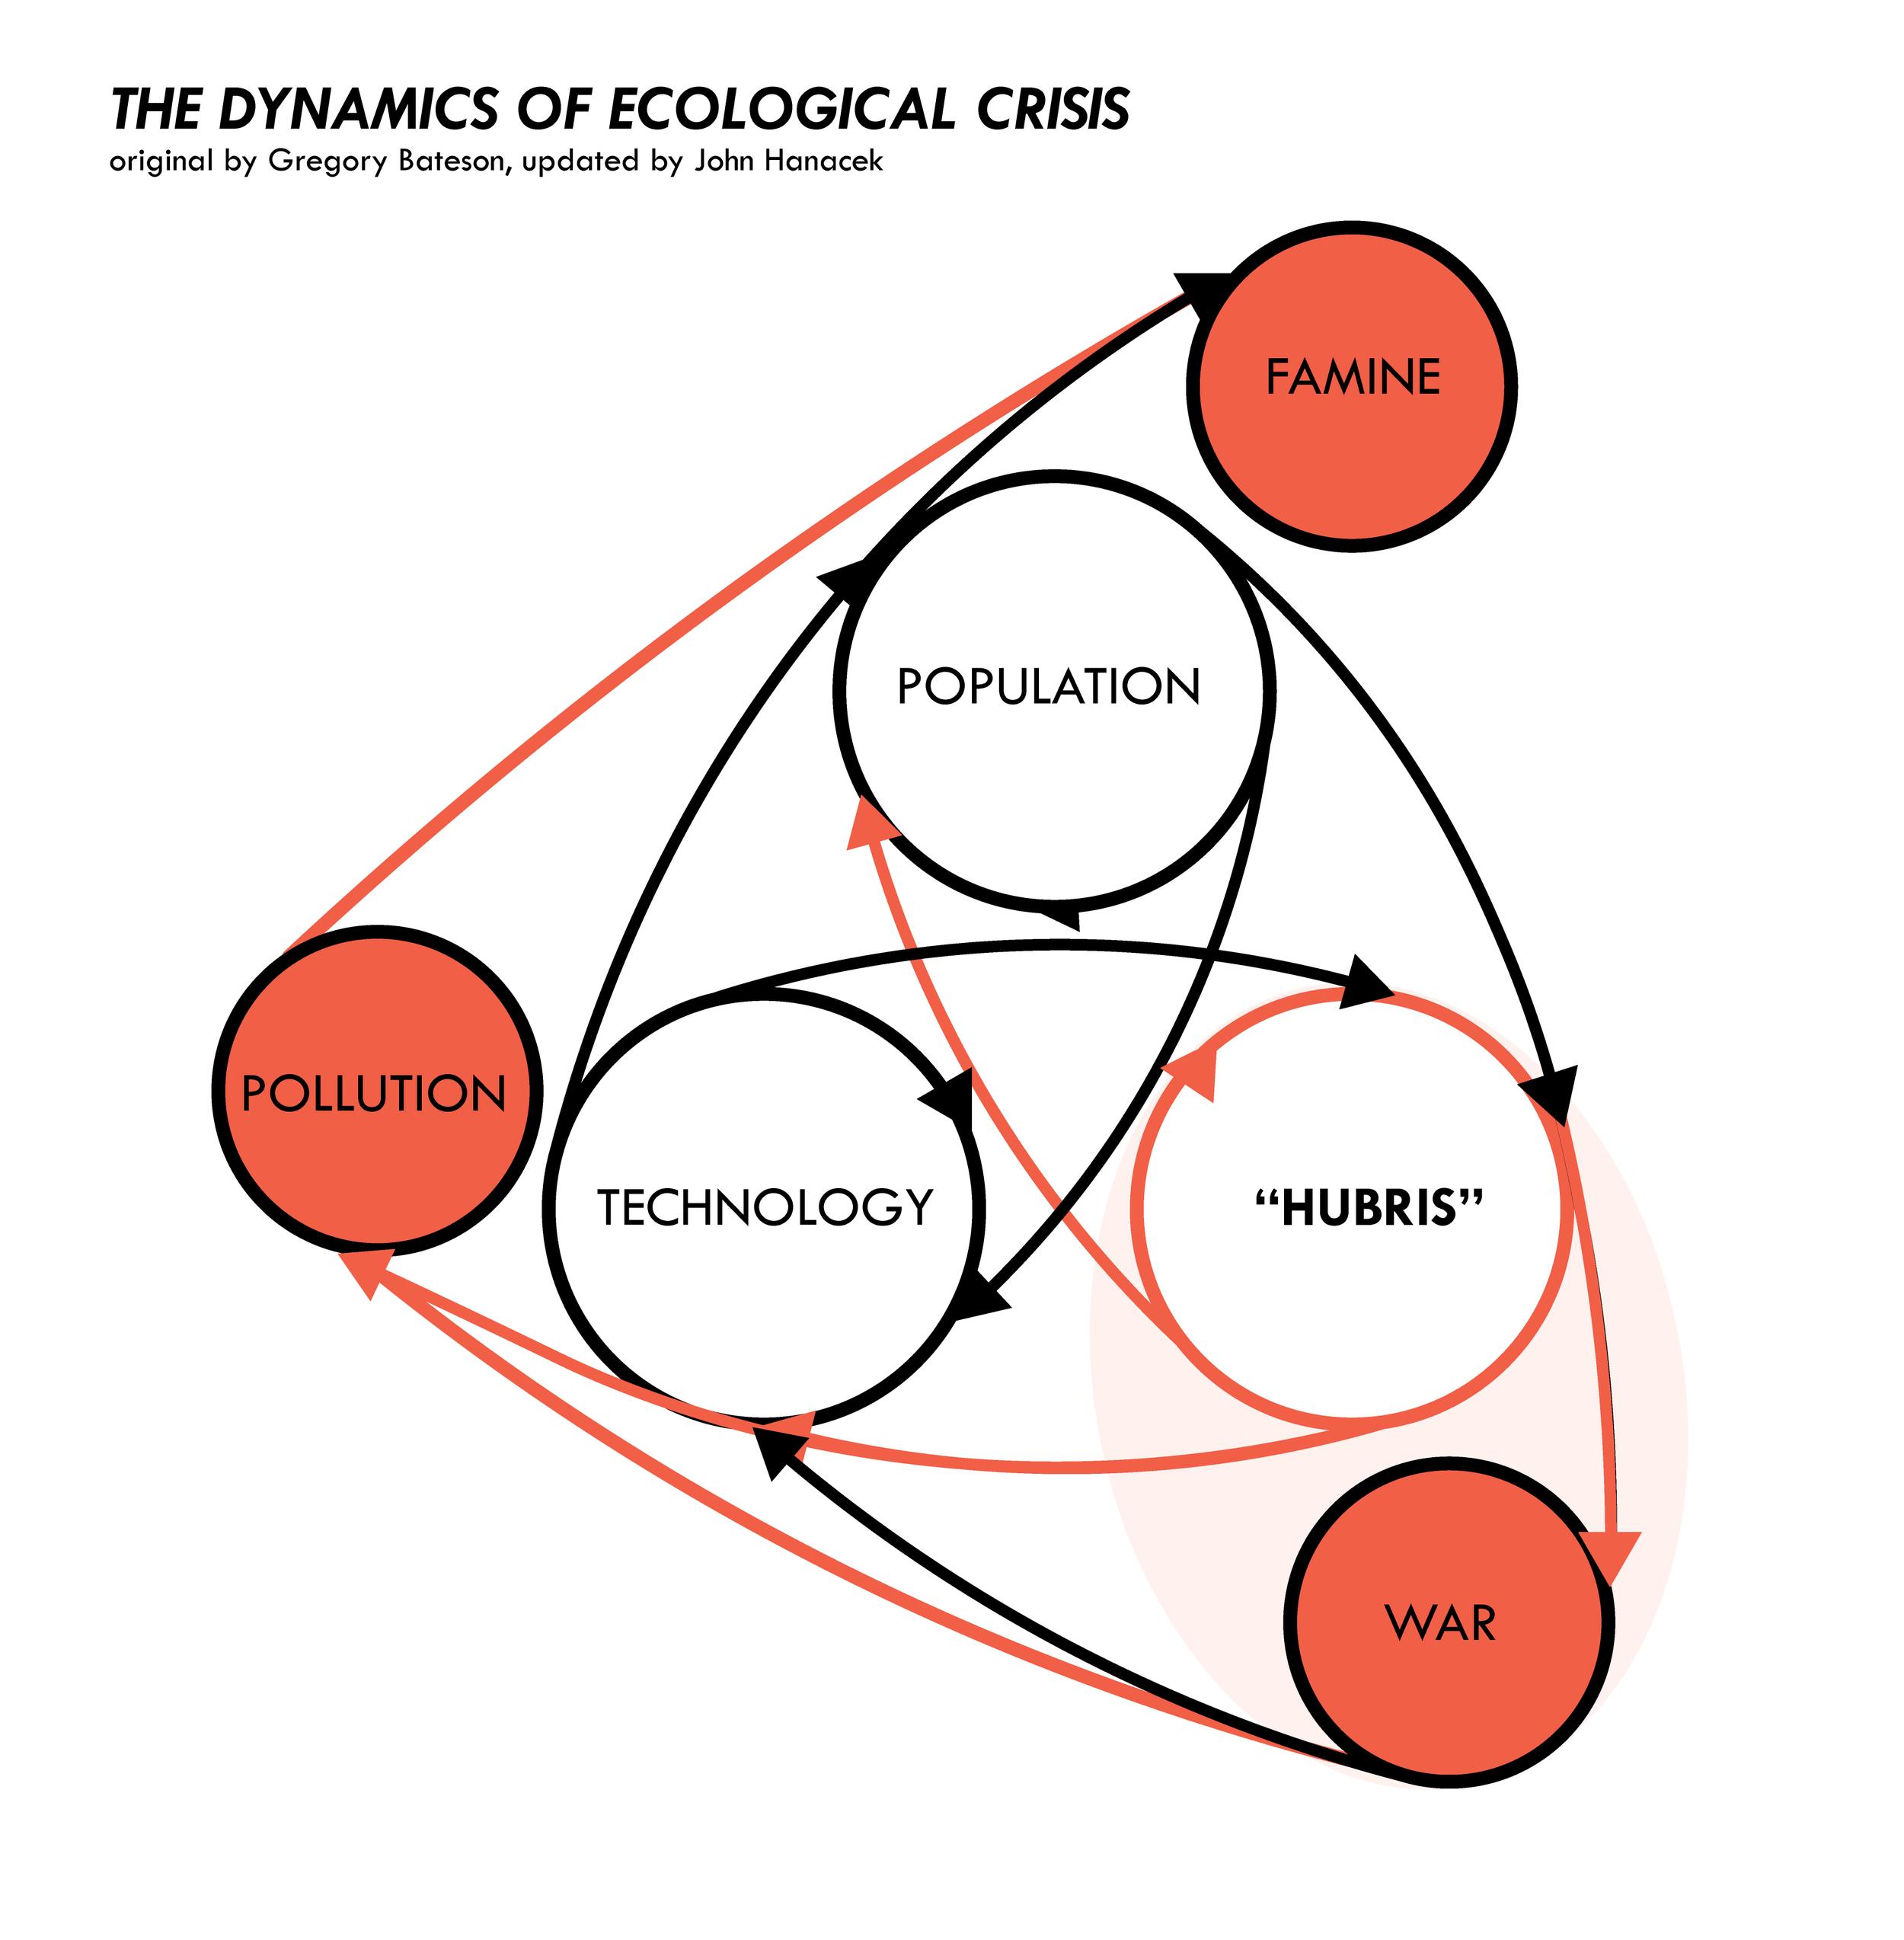 Dynamics of Ecological Crisis bateson-hanacek-w-01.png